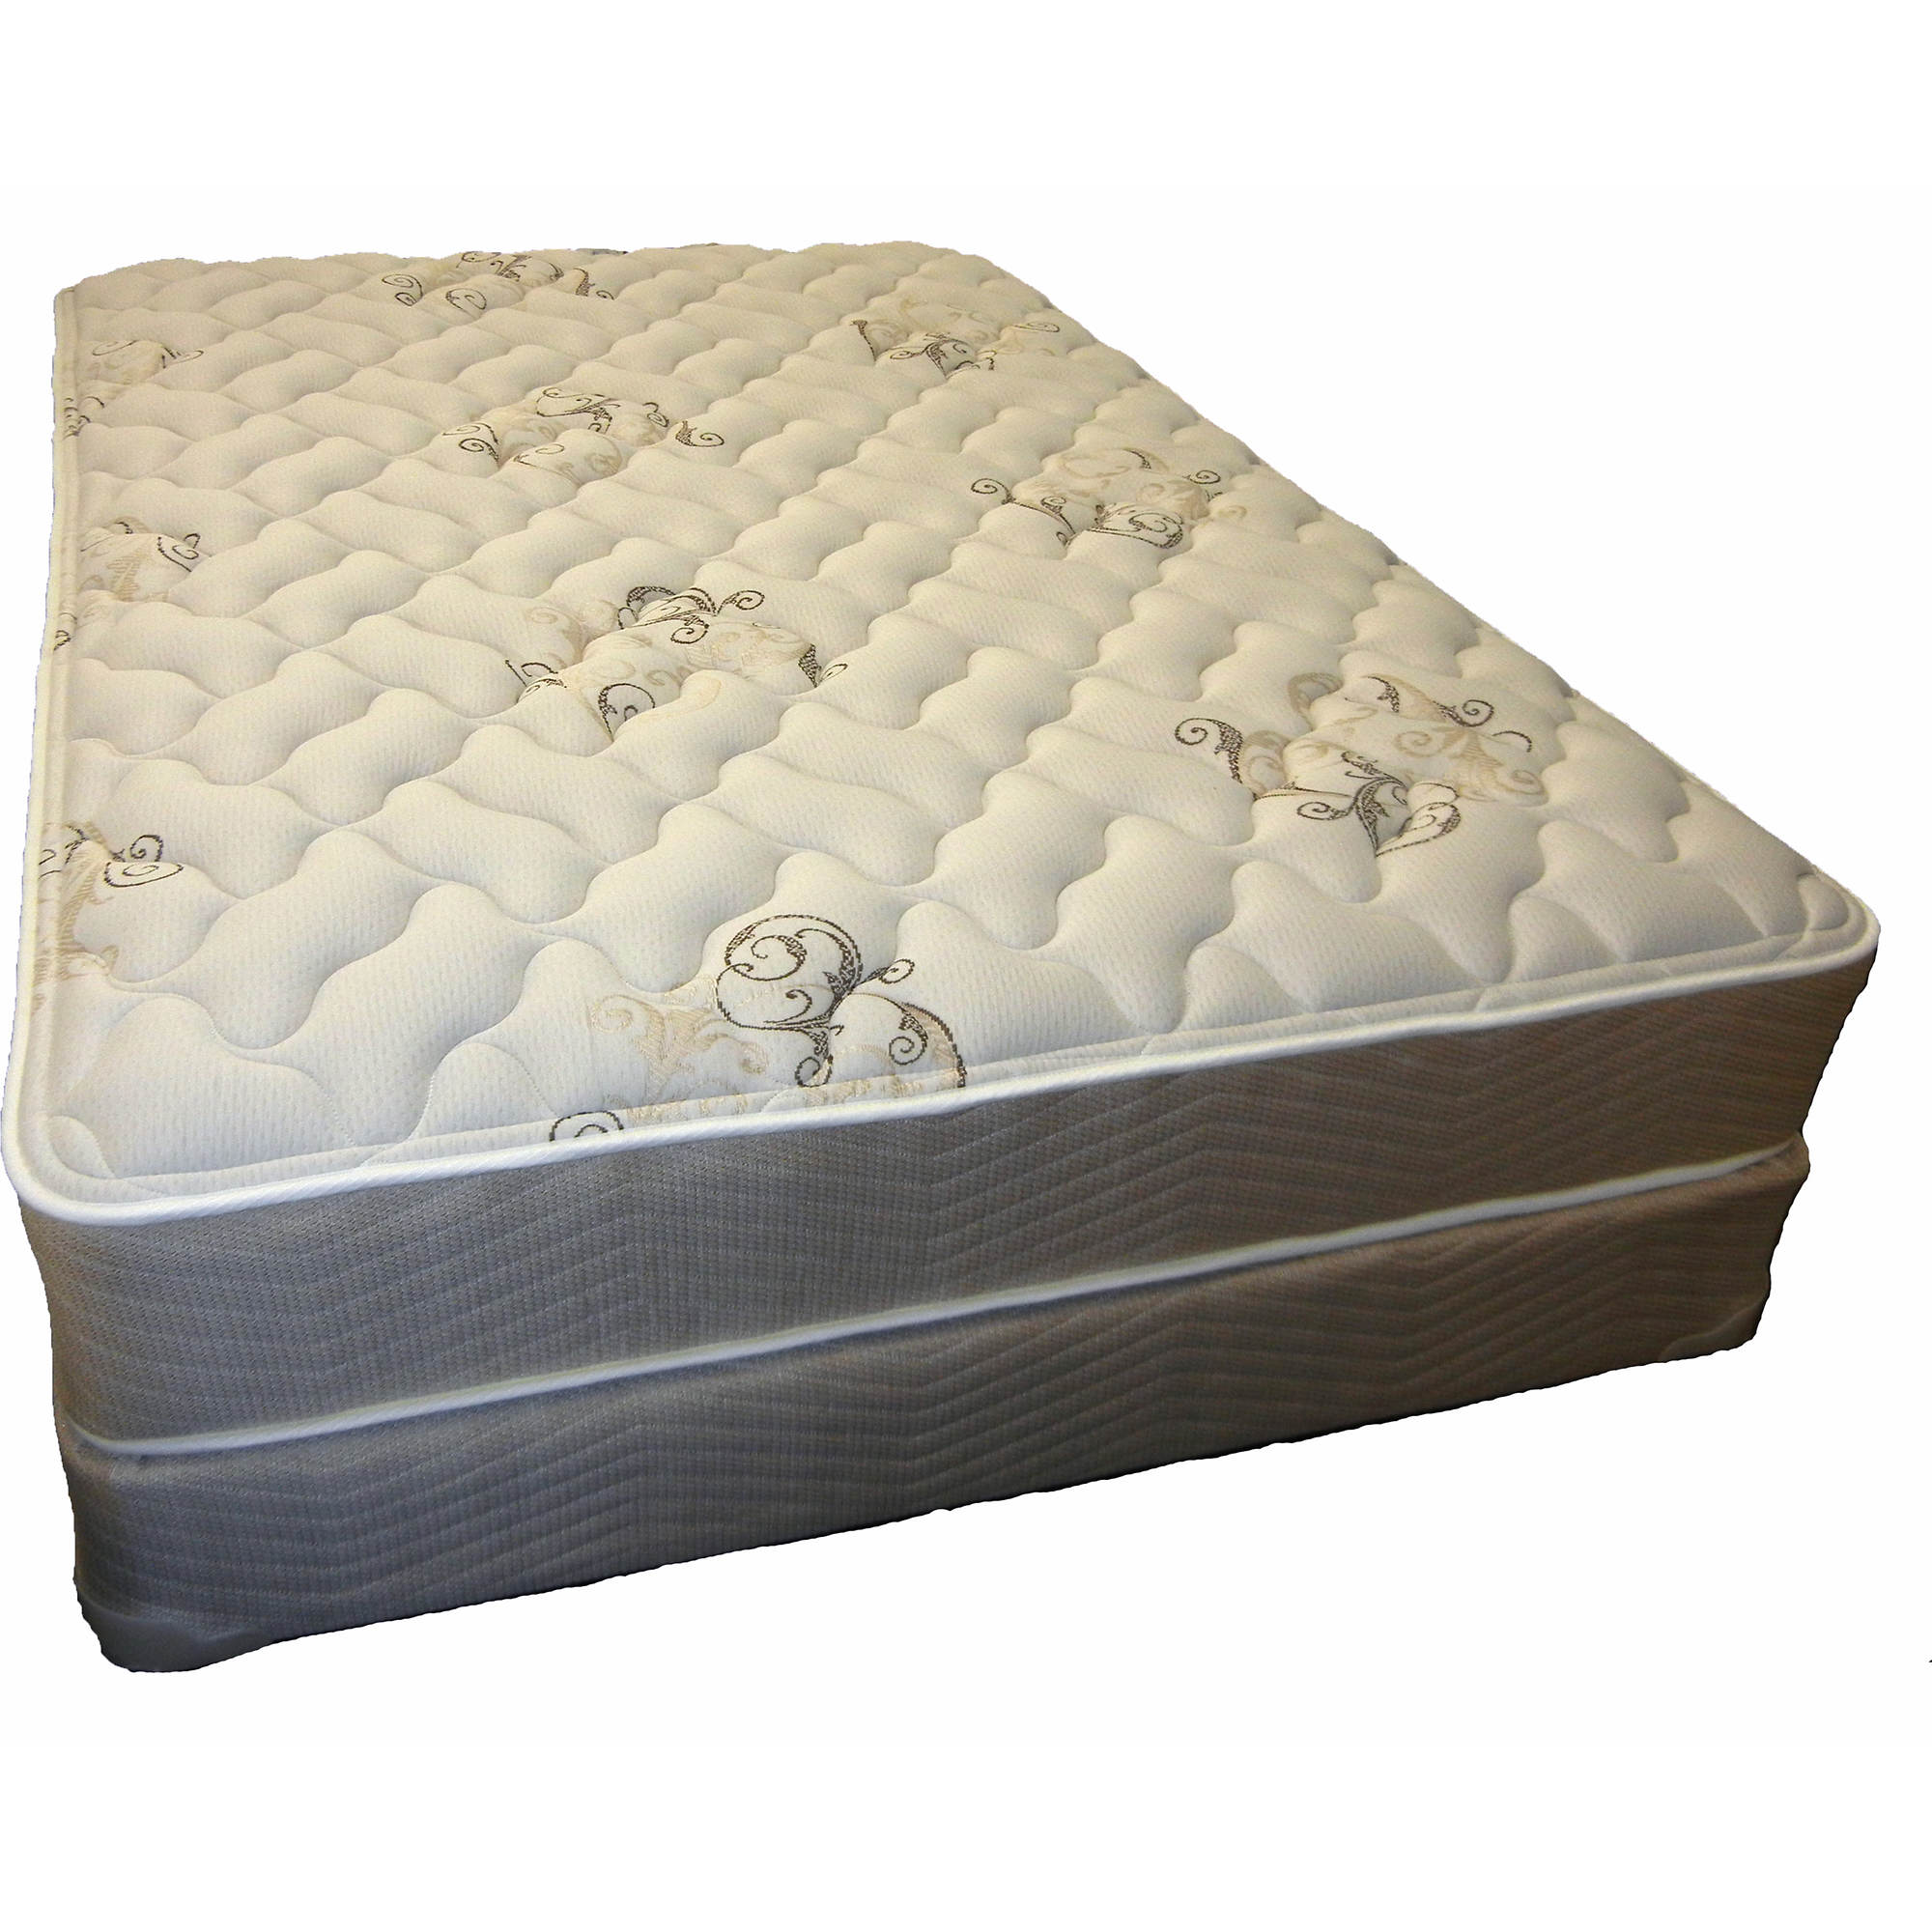 Handy Living Full Size 11 Plush Pillow Top Mattress Sofa